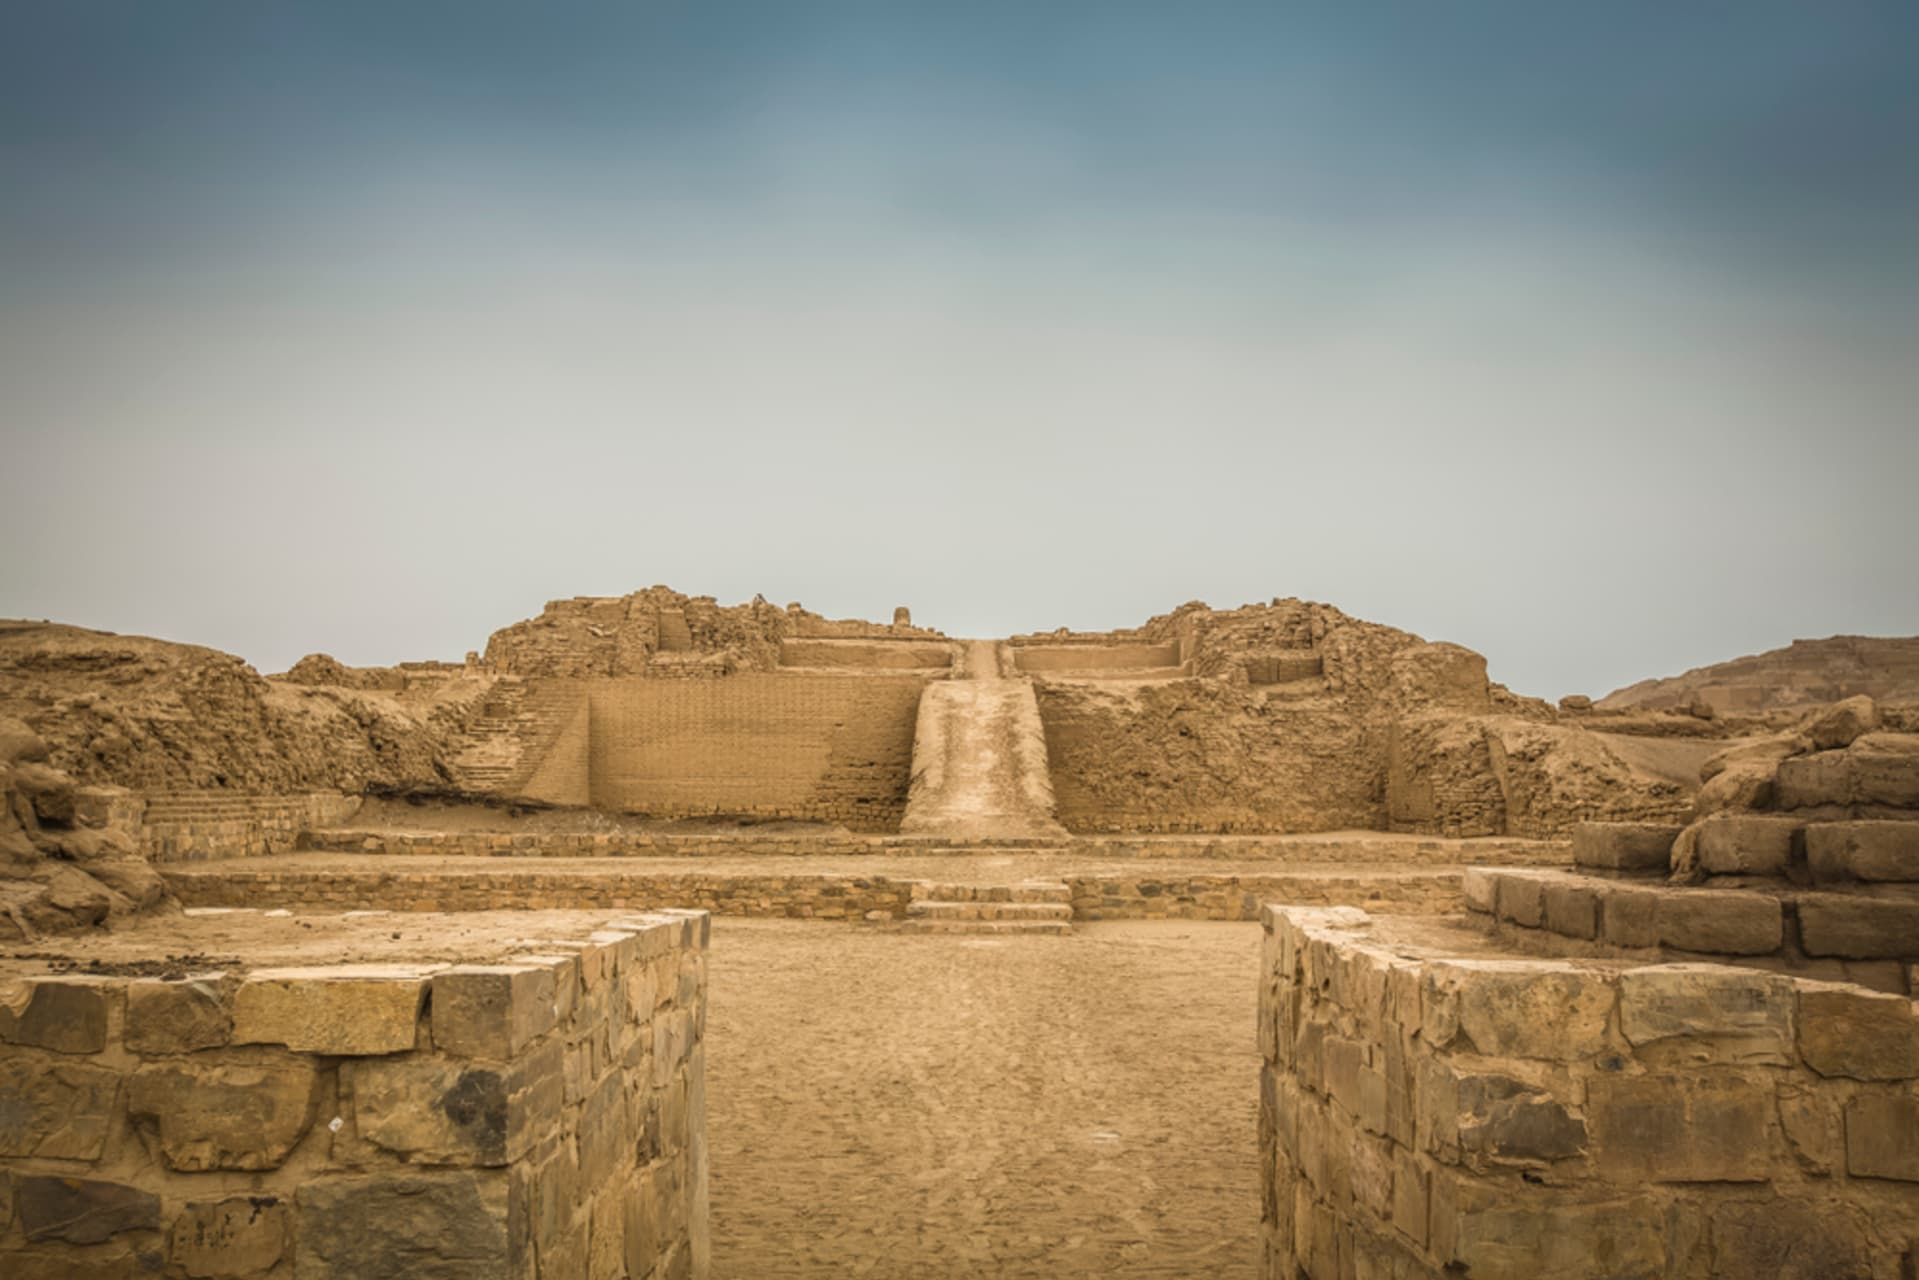 Lima - Pachacamac: A Pre-Hispanic Oracle on the Pacific Coast